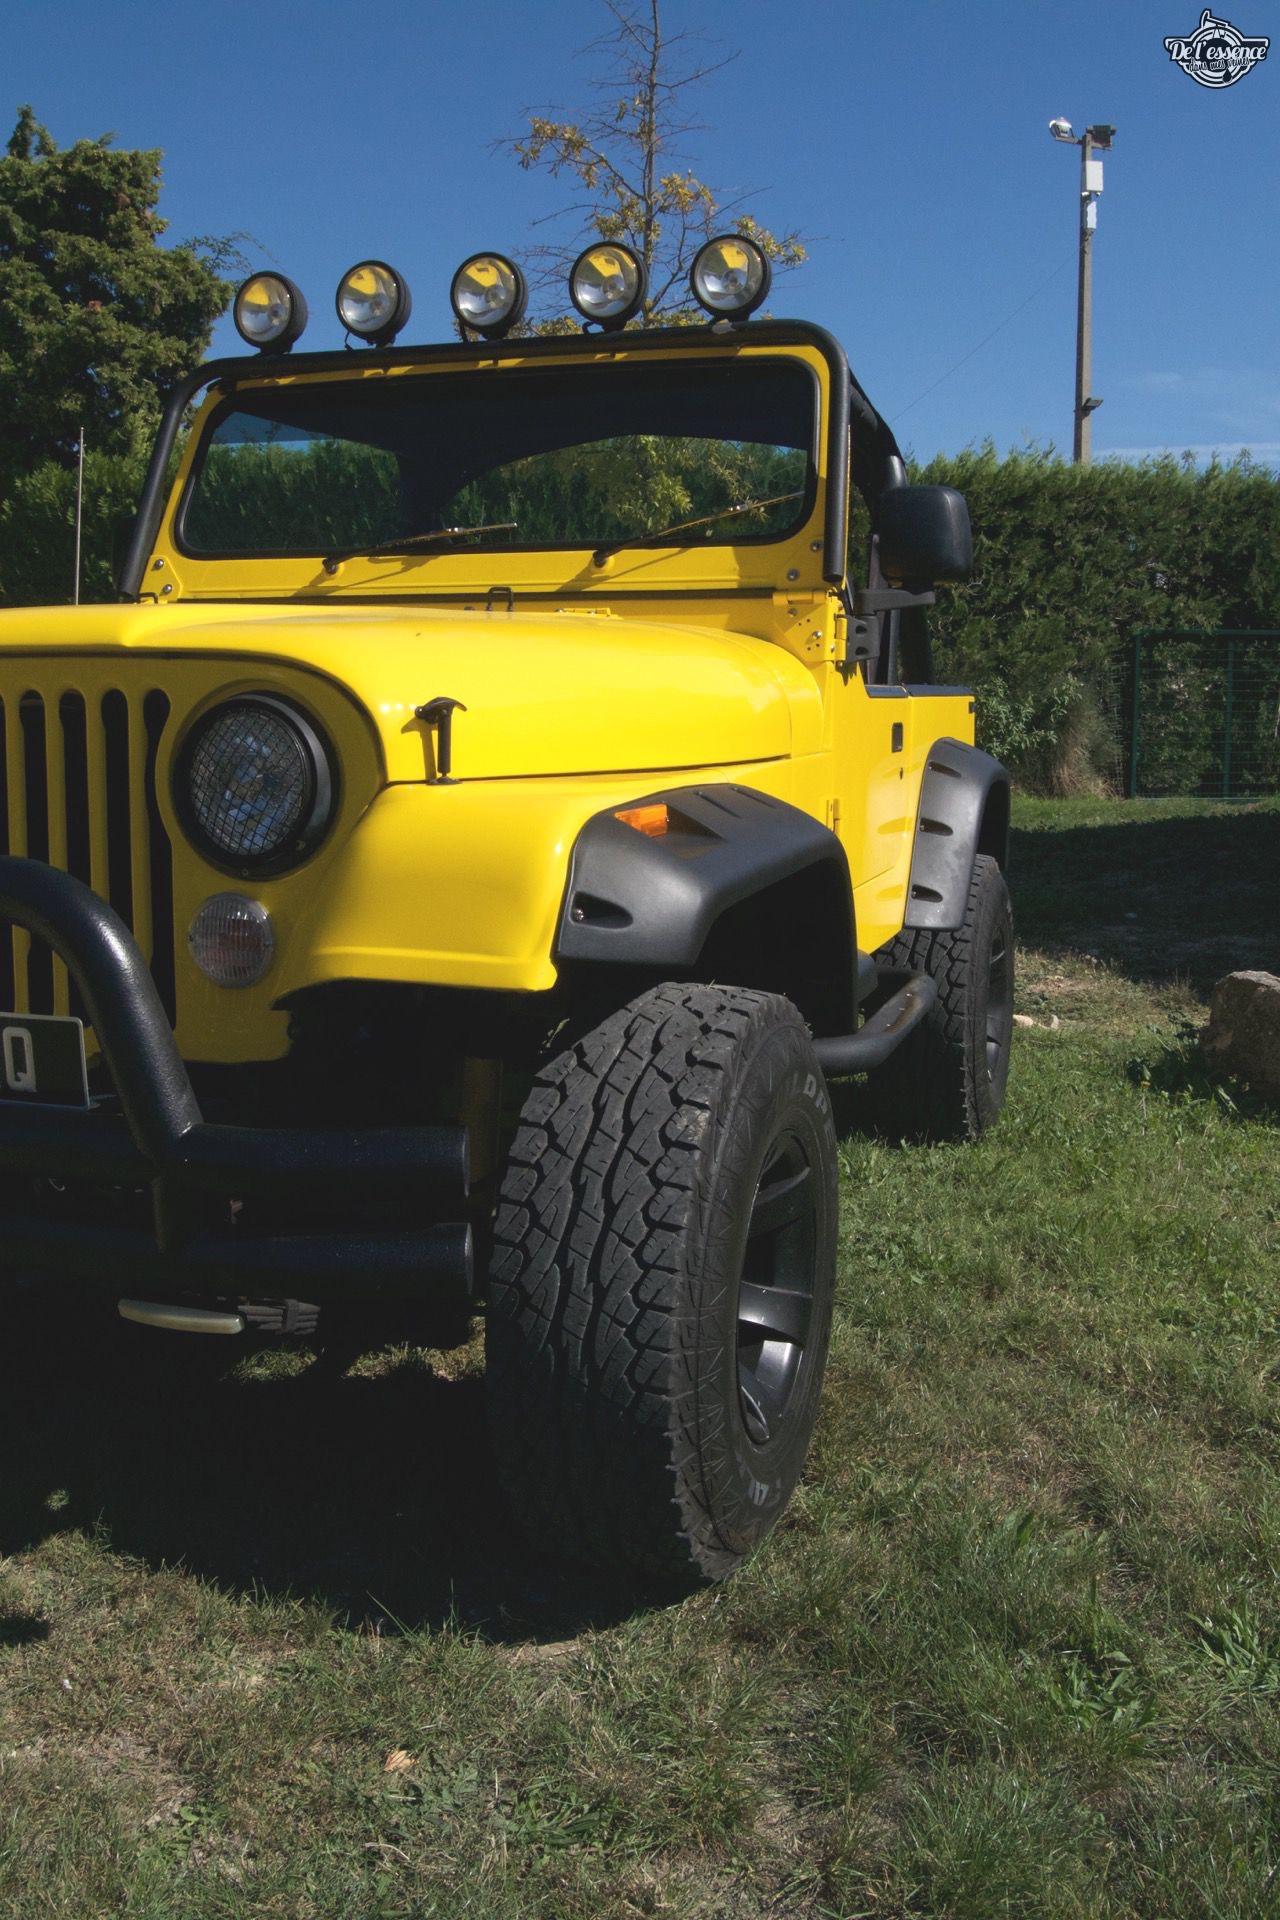 '82 Jeep CJ-7 Laredo - Quand tu te fais chier sur la route... 70